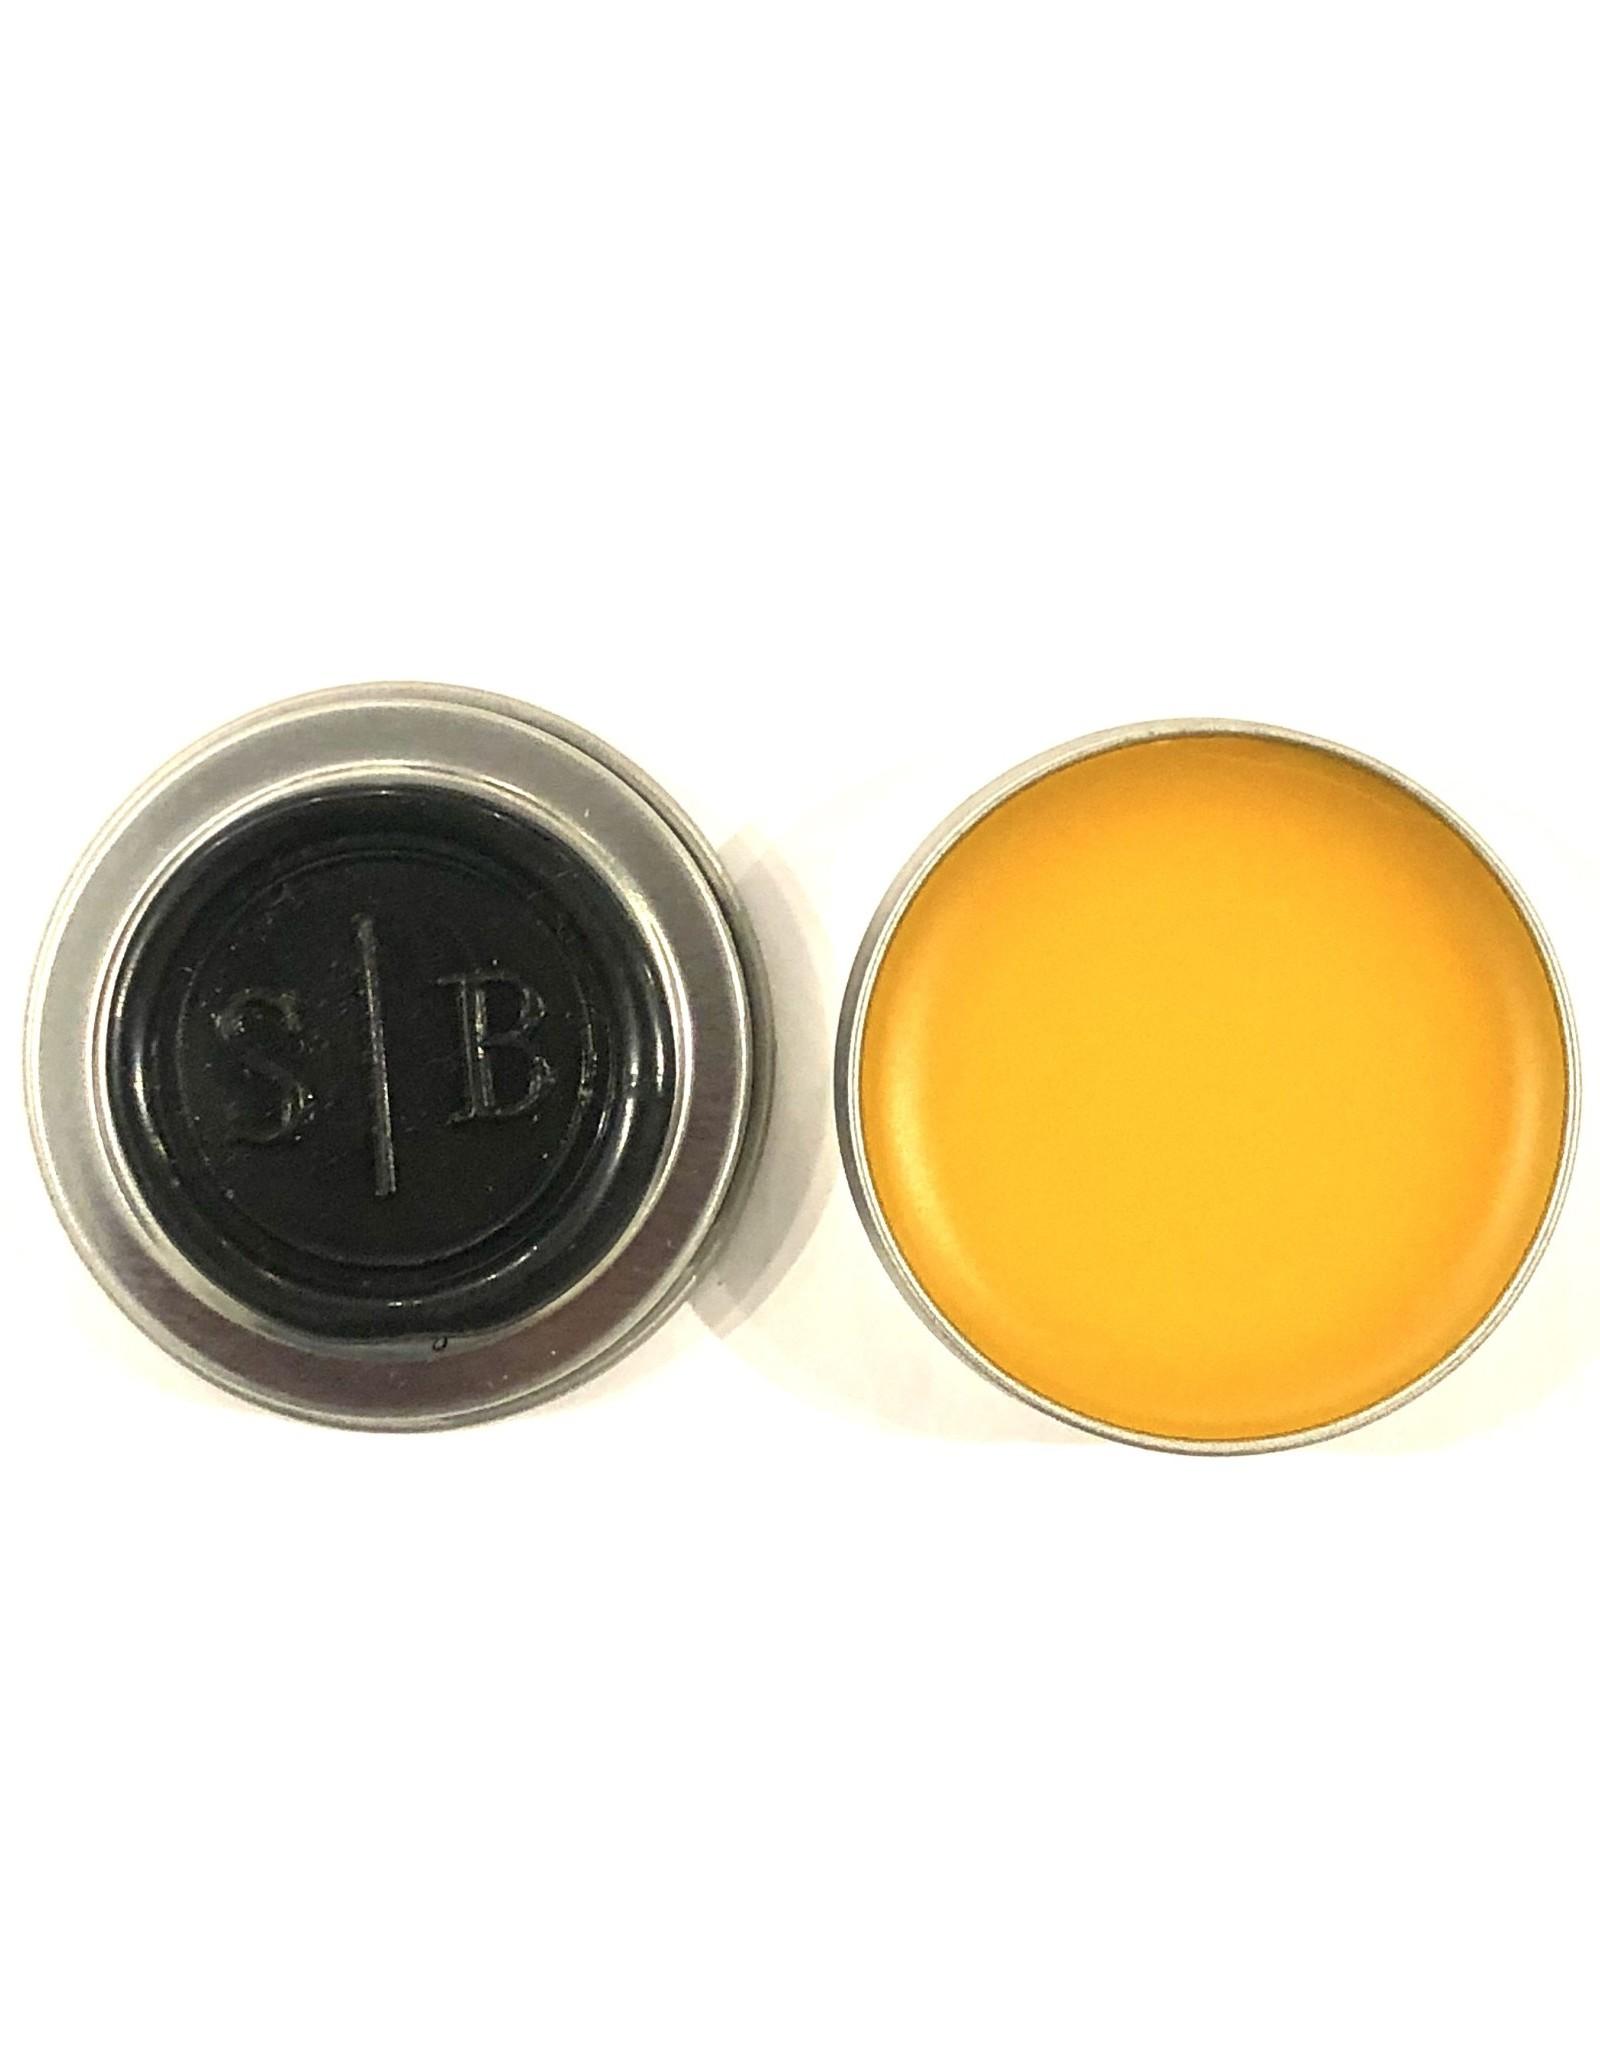 Scandic Botanica 5 oz. Serum Solid